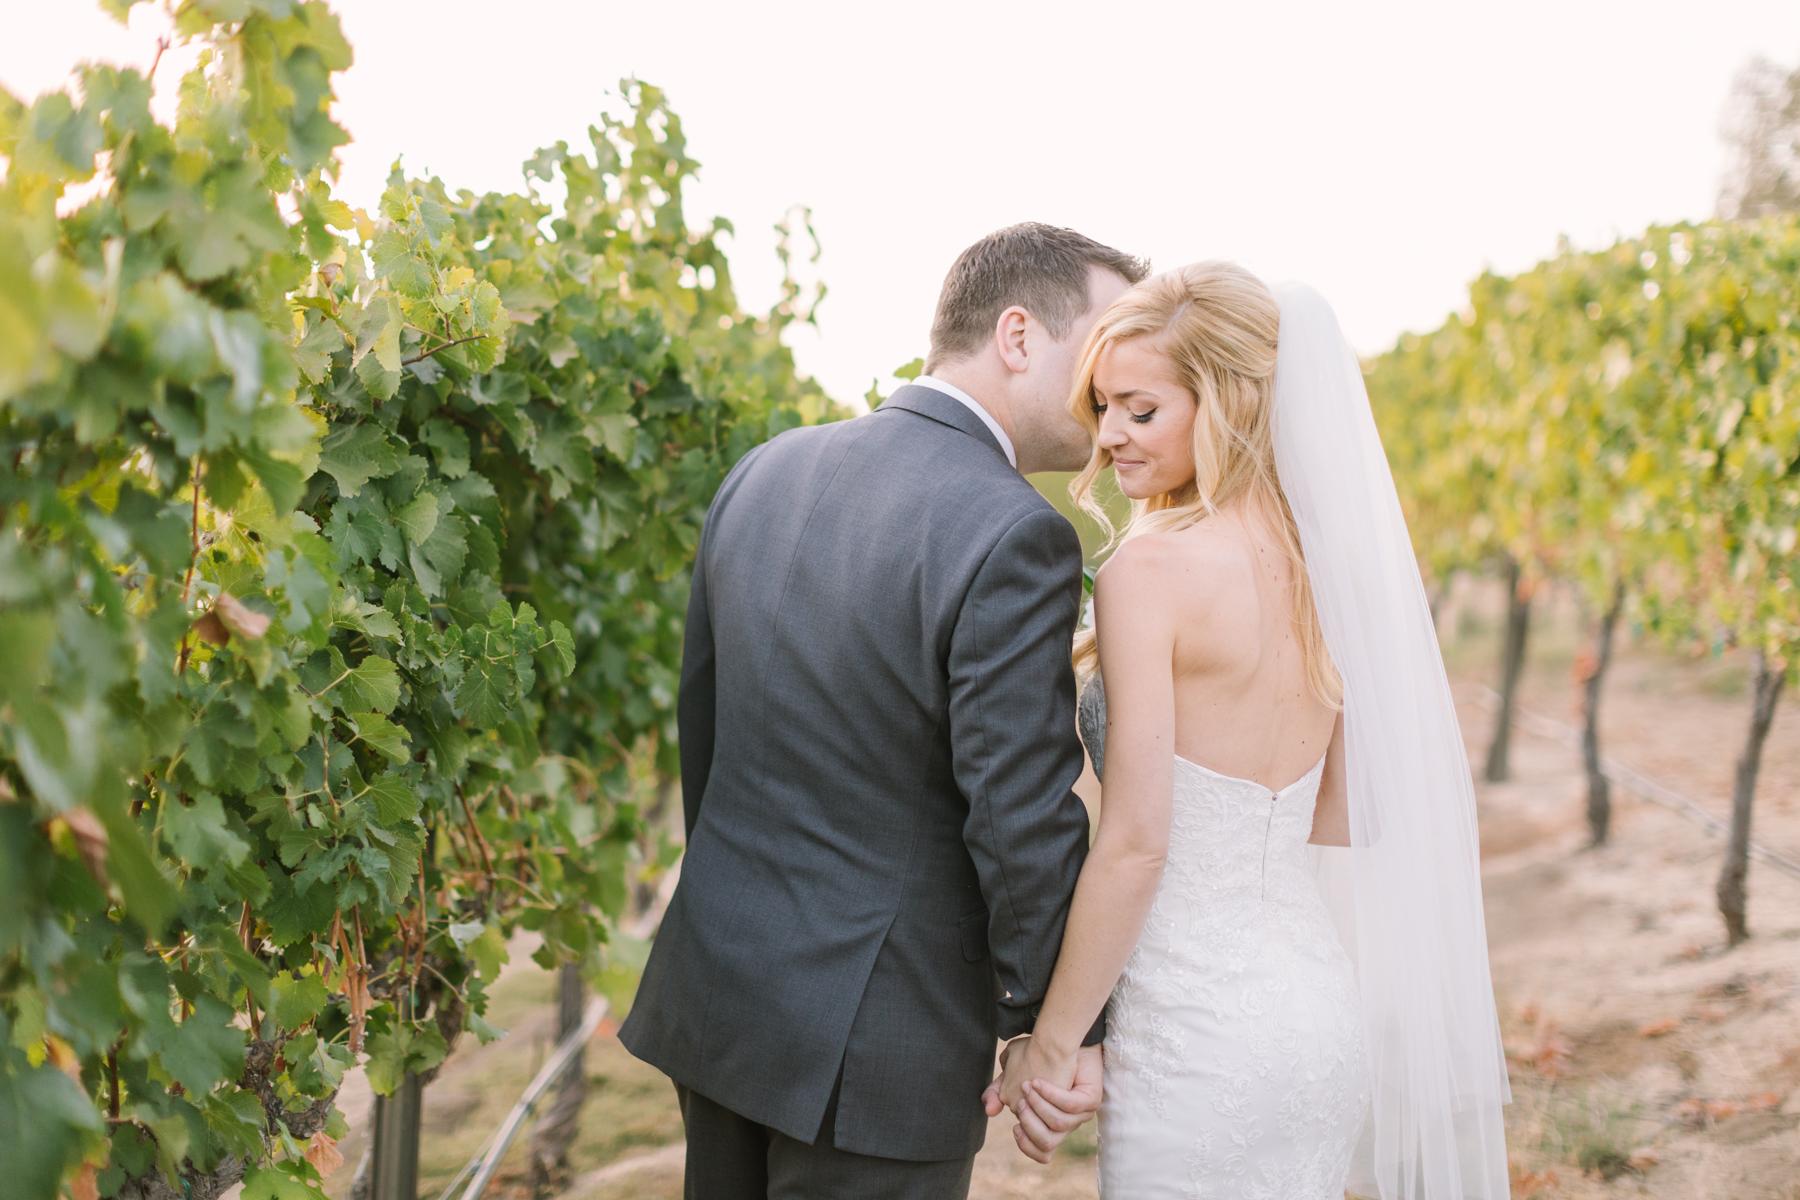 Orange-County-Wedding-Photography-Brianna-Caster-and-Co-Photographers-Falkner-Winery-Wedding-8